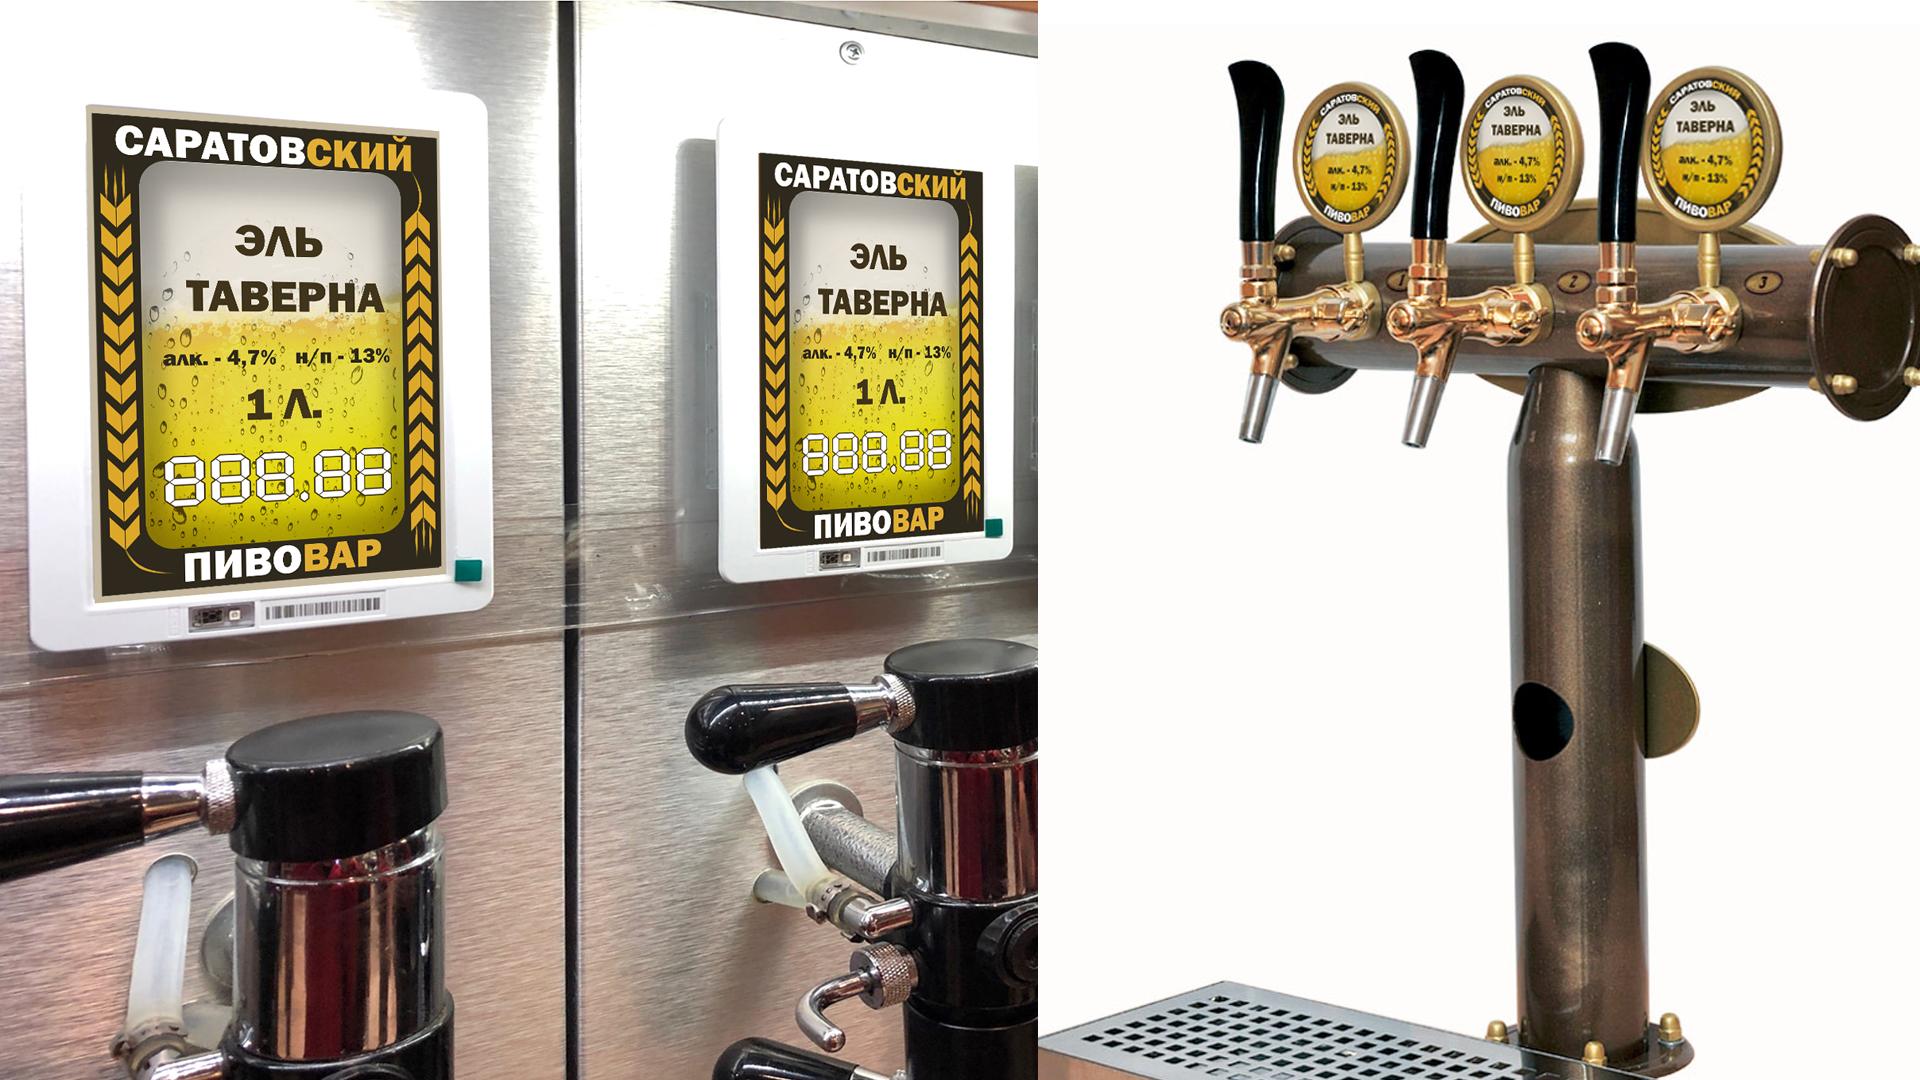 Разработка логотипа для частной пивоварни фото f_9575d7c95d1d6abe.jpg